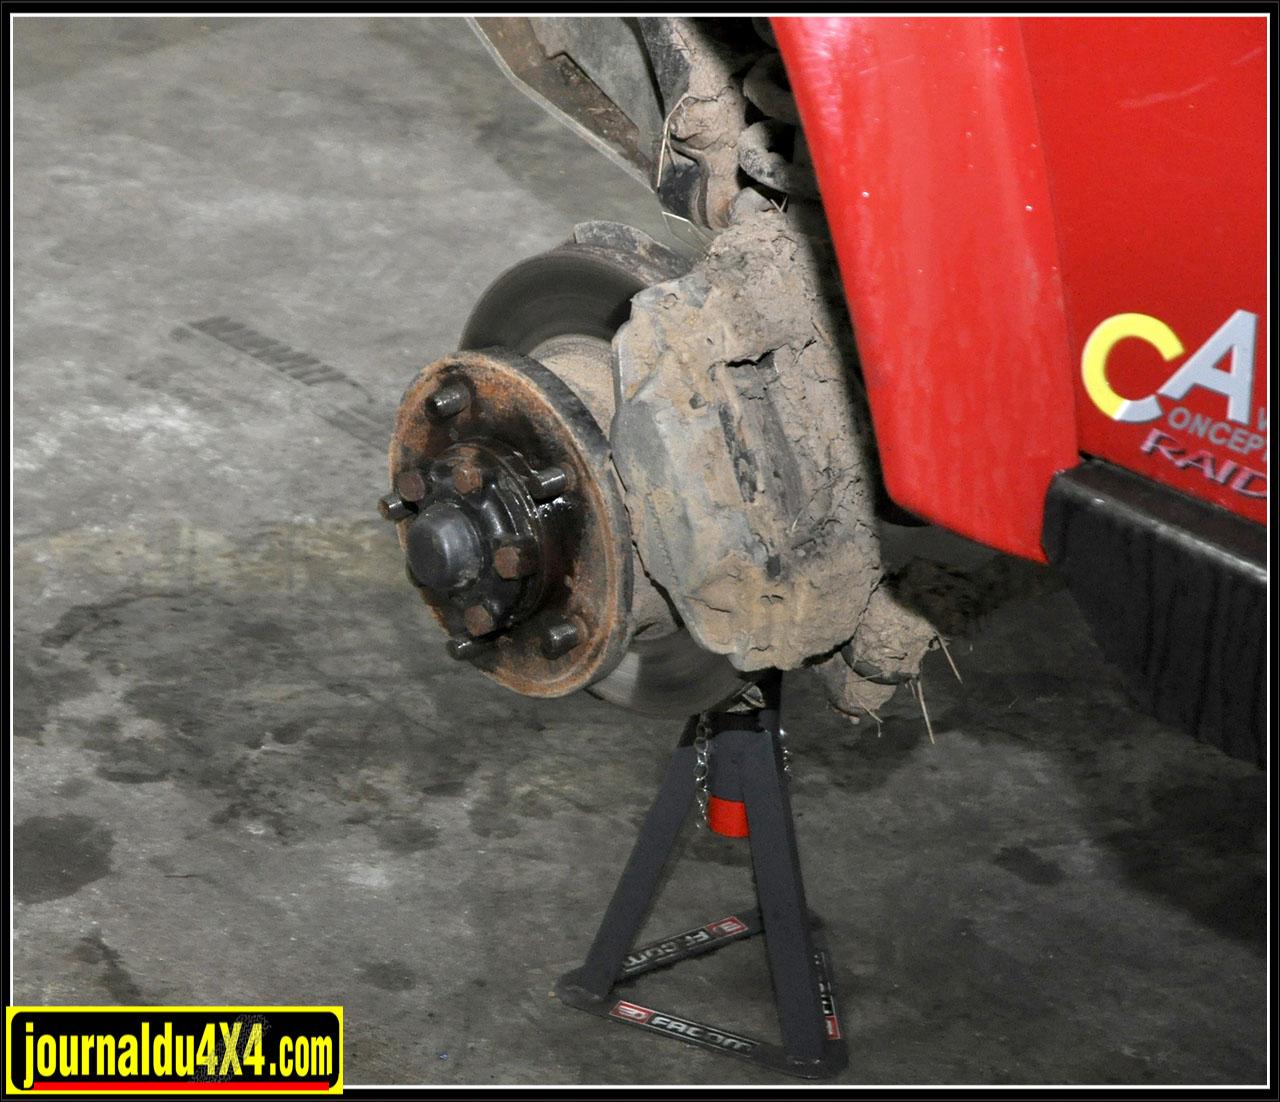 montage-pneu-4x4-6.jpg